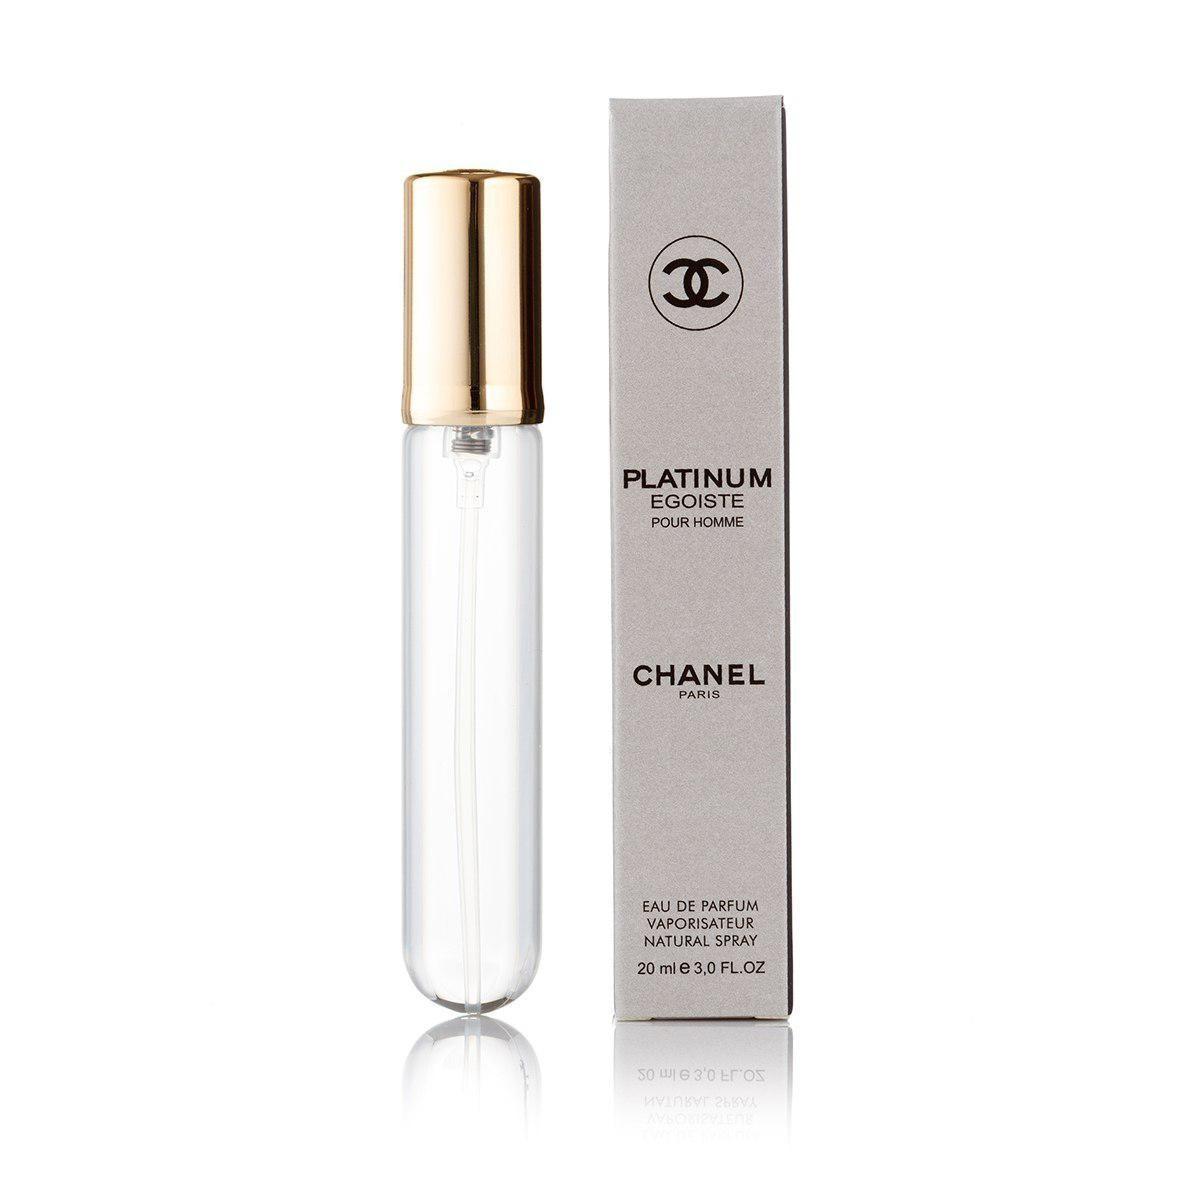 Chanel Egoiste Platinum - Parfum Stick 20ml